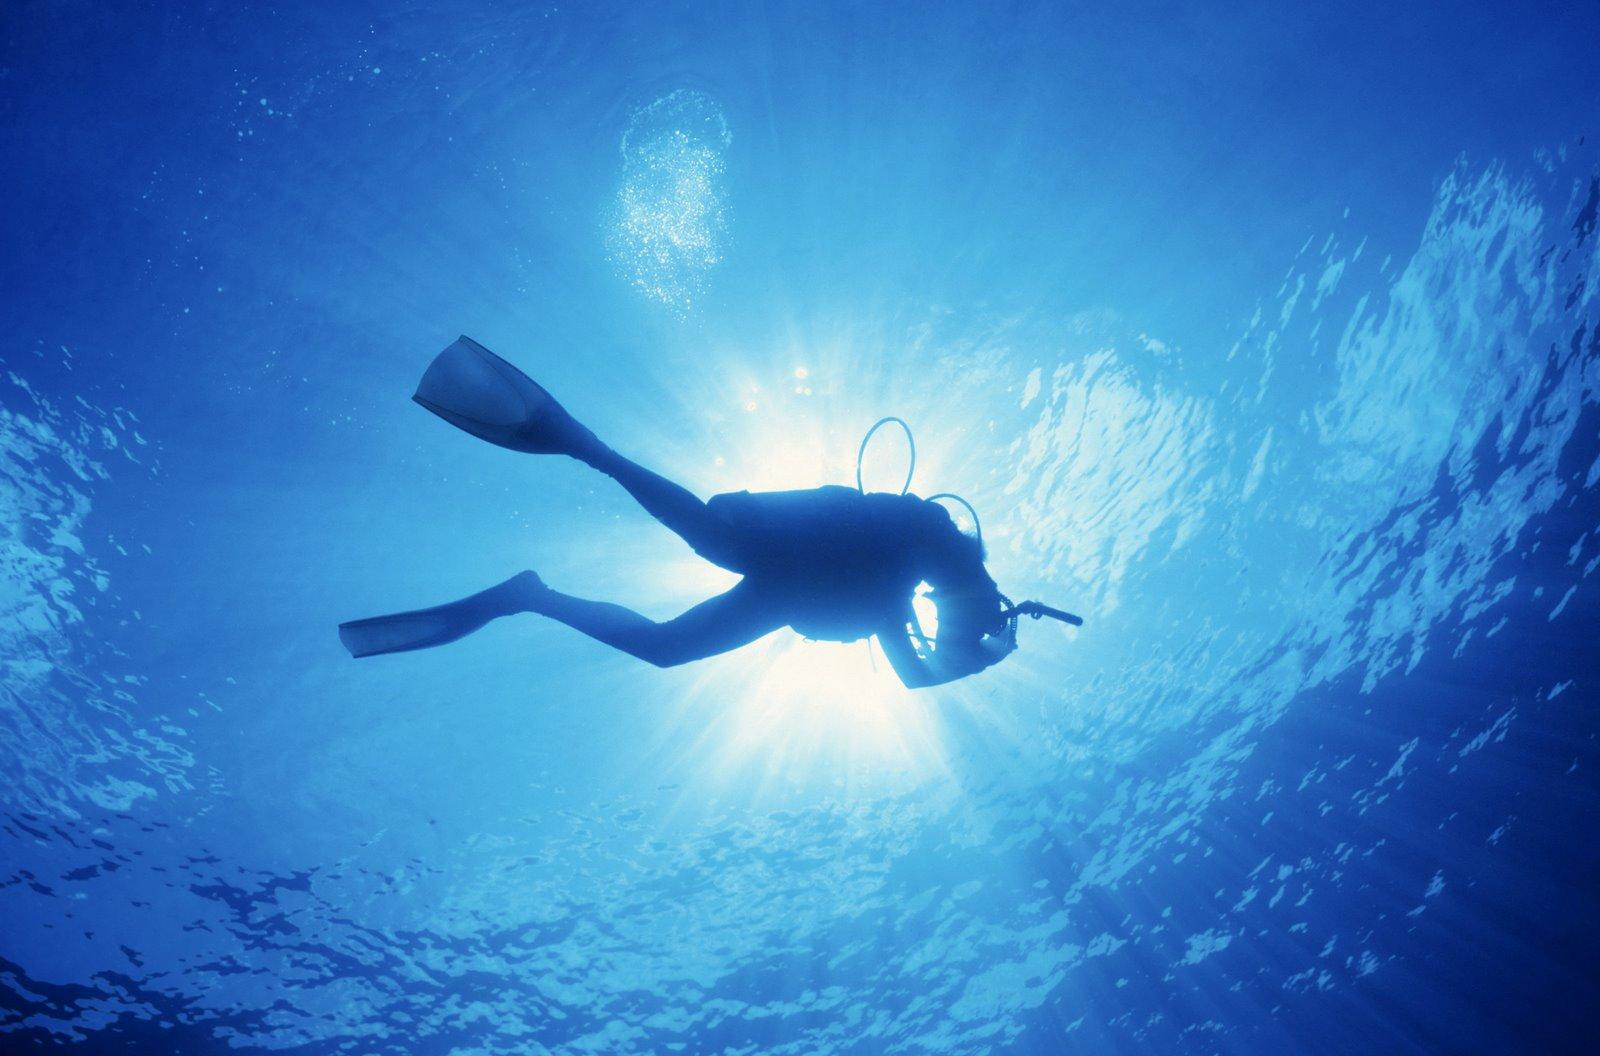 adenan hd wallpaper underwater - photo #48